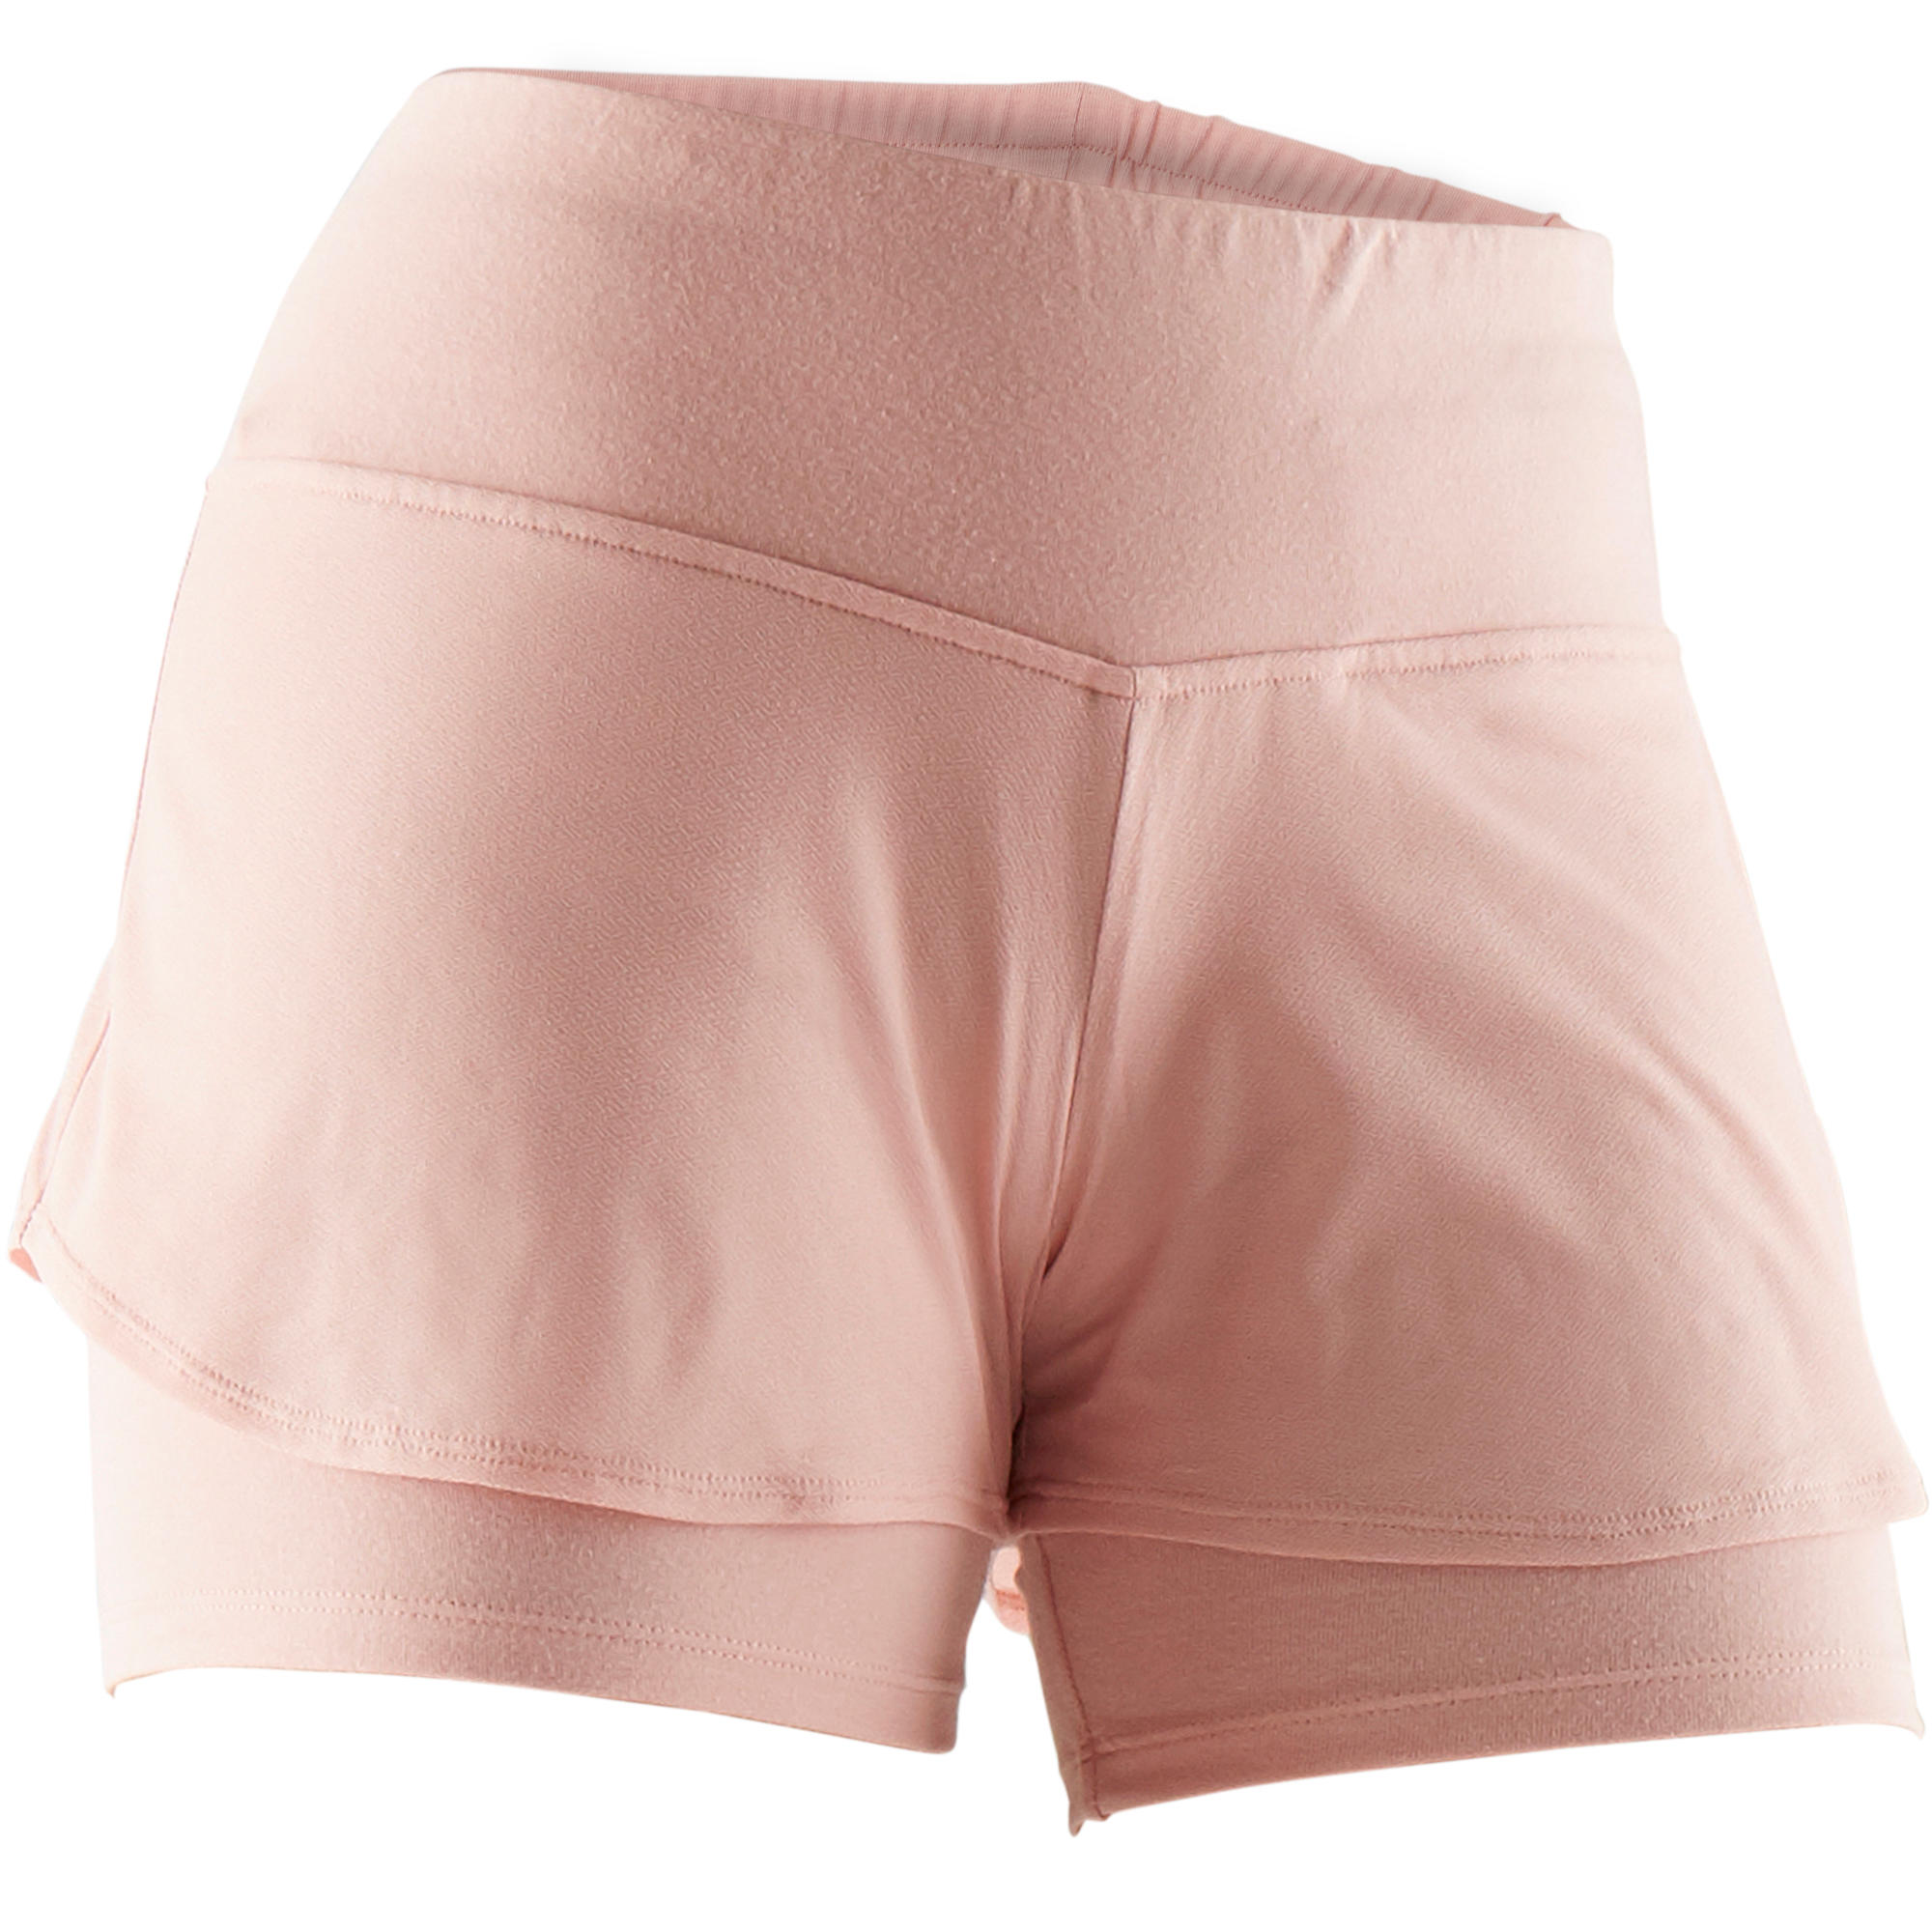 Short 520 Pilates y Gimnasia suave mujer rosa claro